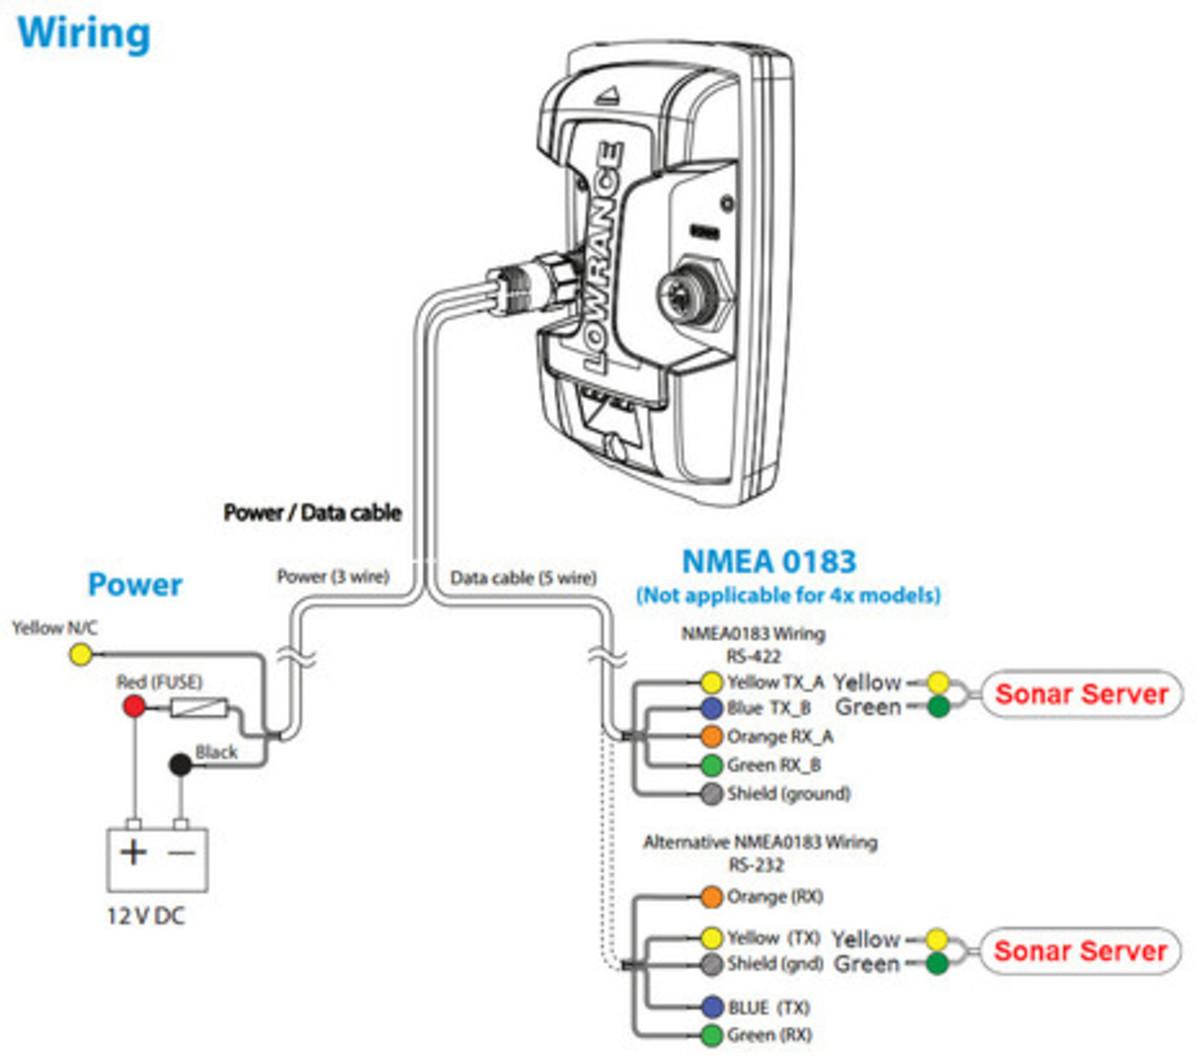 hight resolution of wiring diagram for lowrance 3d sonar network wiring diagram databasedigital yacht sonar server keeping it